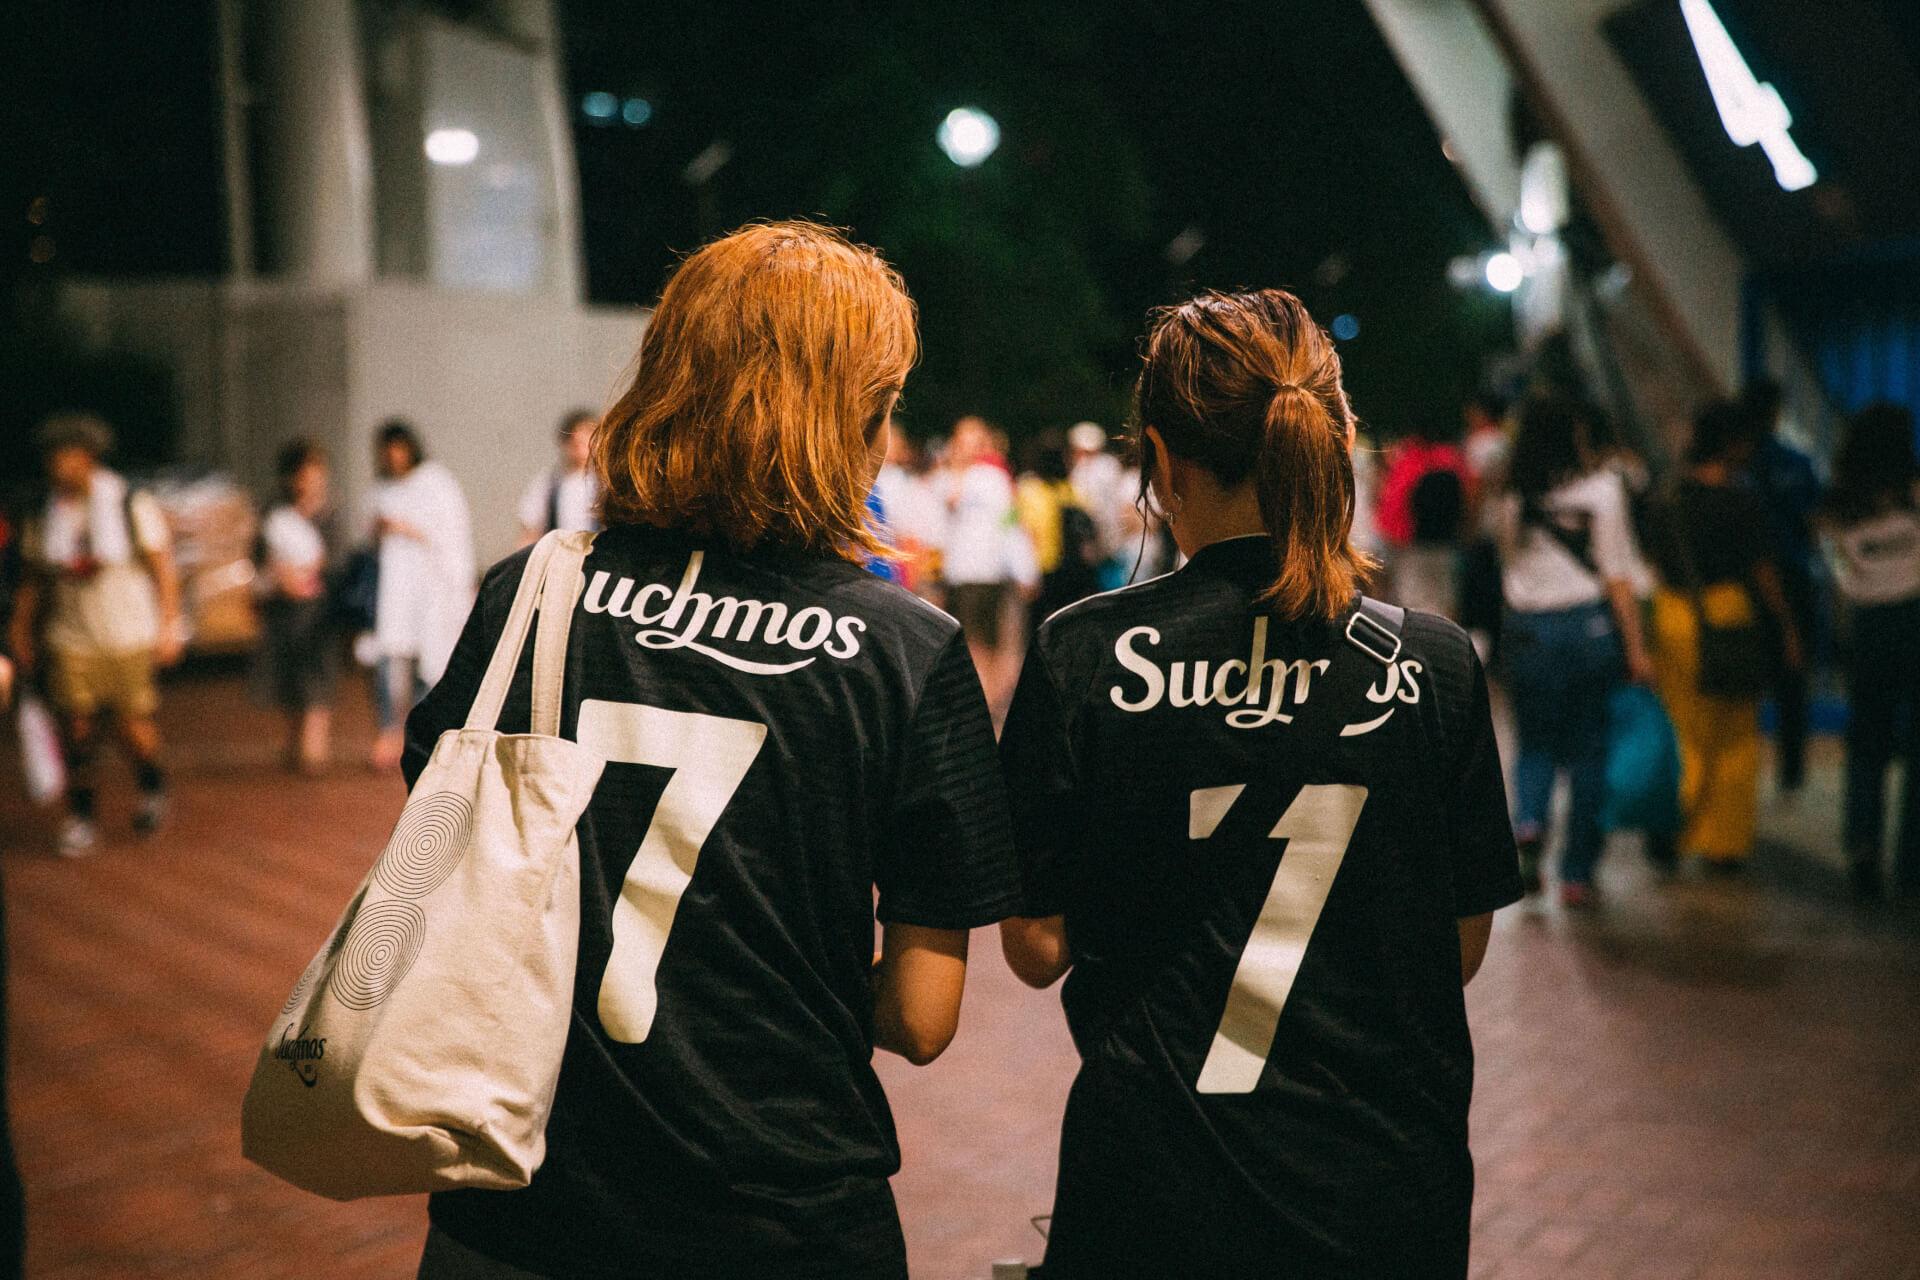 【Photo Documentary】Suchmos THE LIVE 横浜スタジアム report0920_suchmos_30